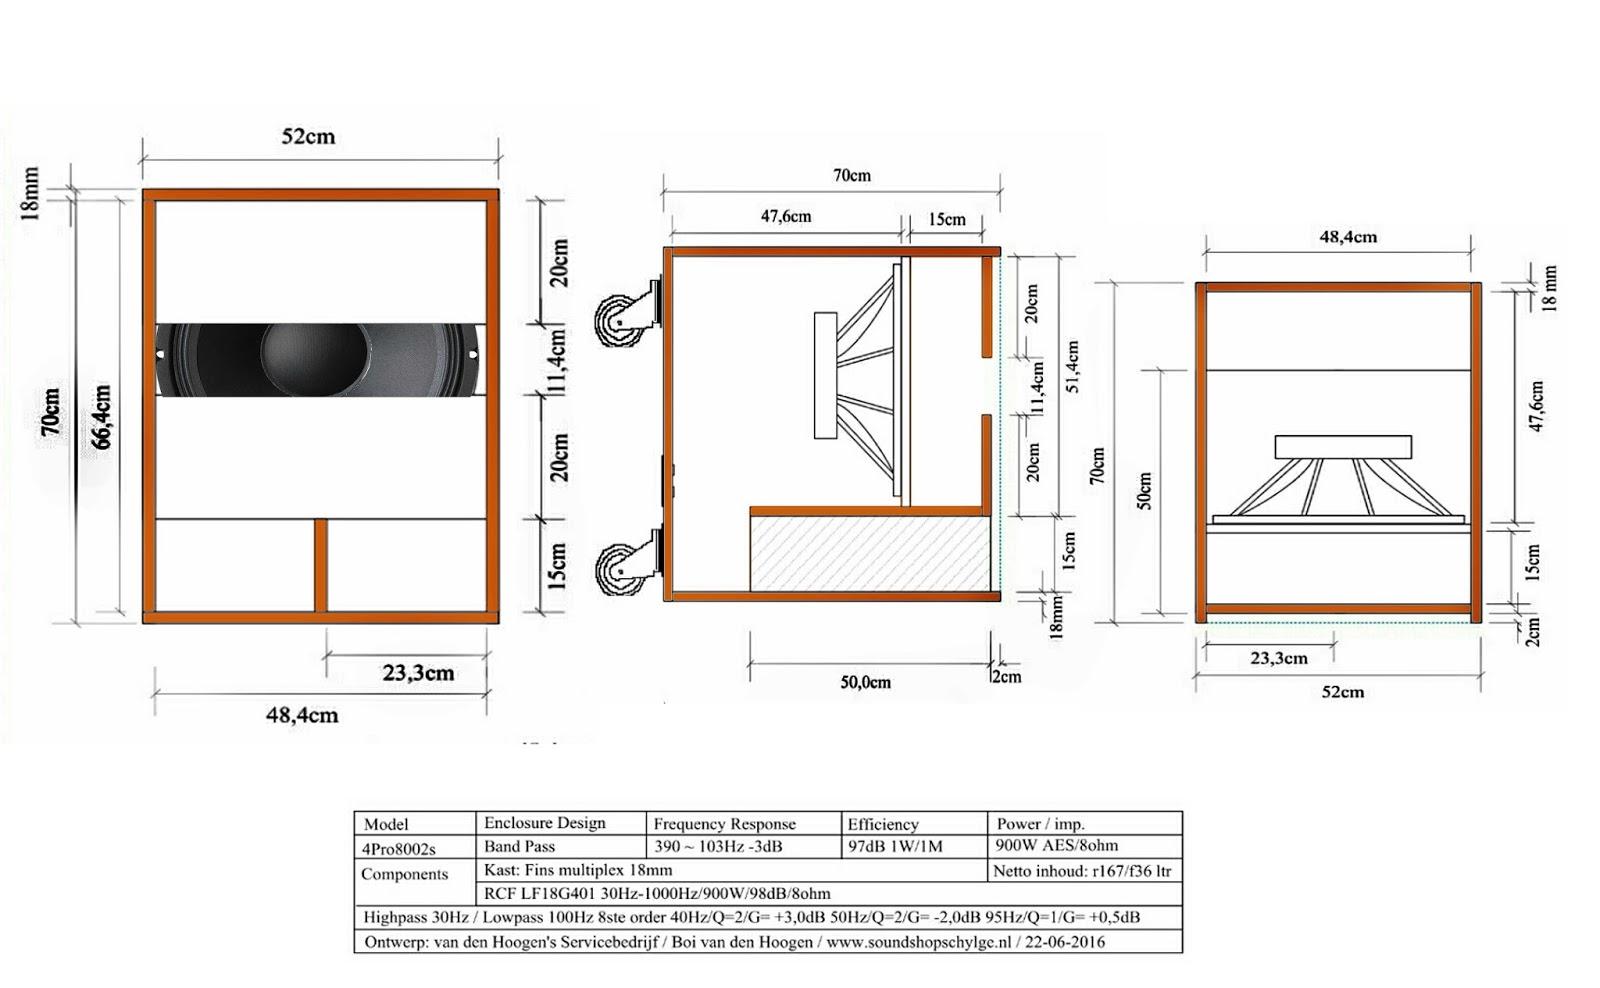 Subwoofer plans 18 inch RCF LF18G401